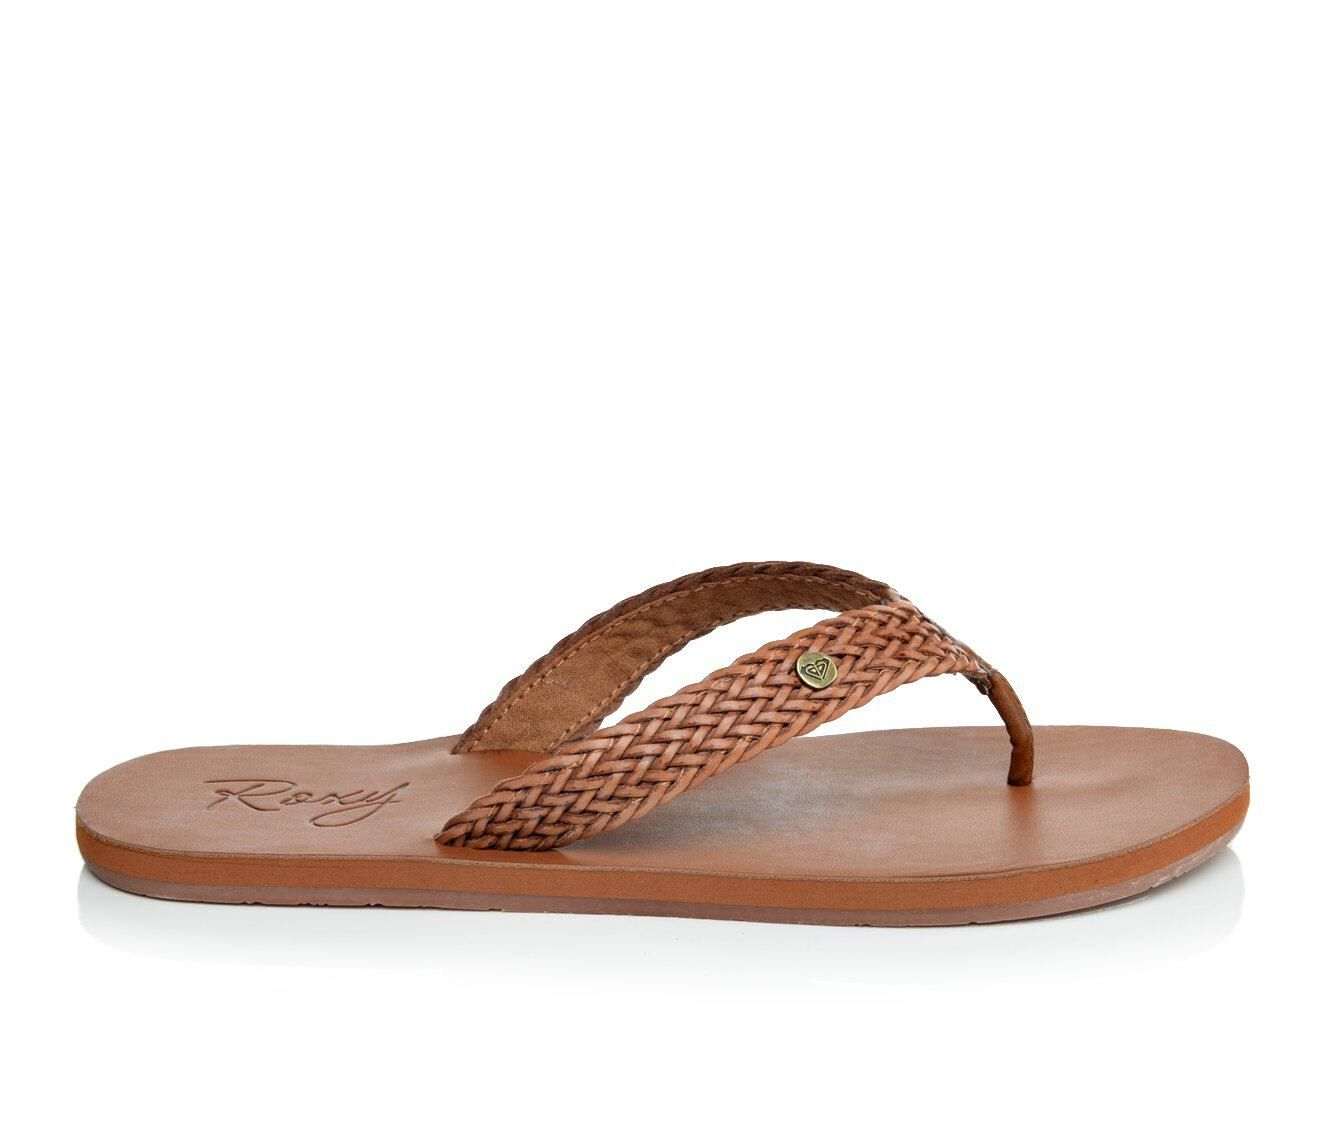 uk shoes_kd7148